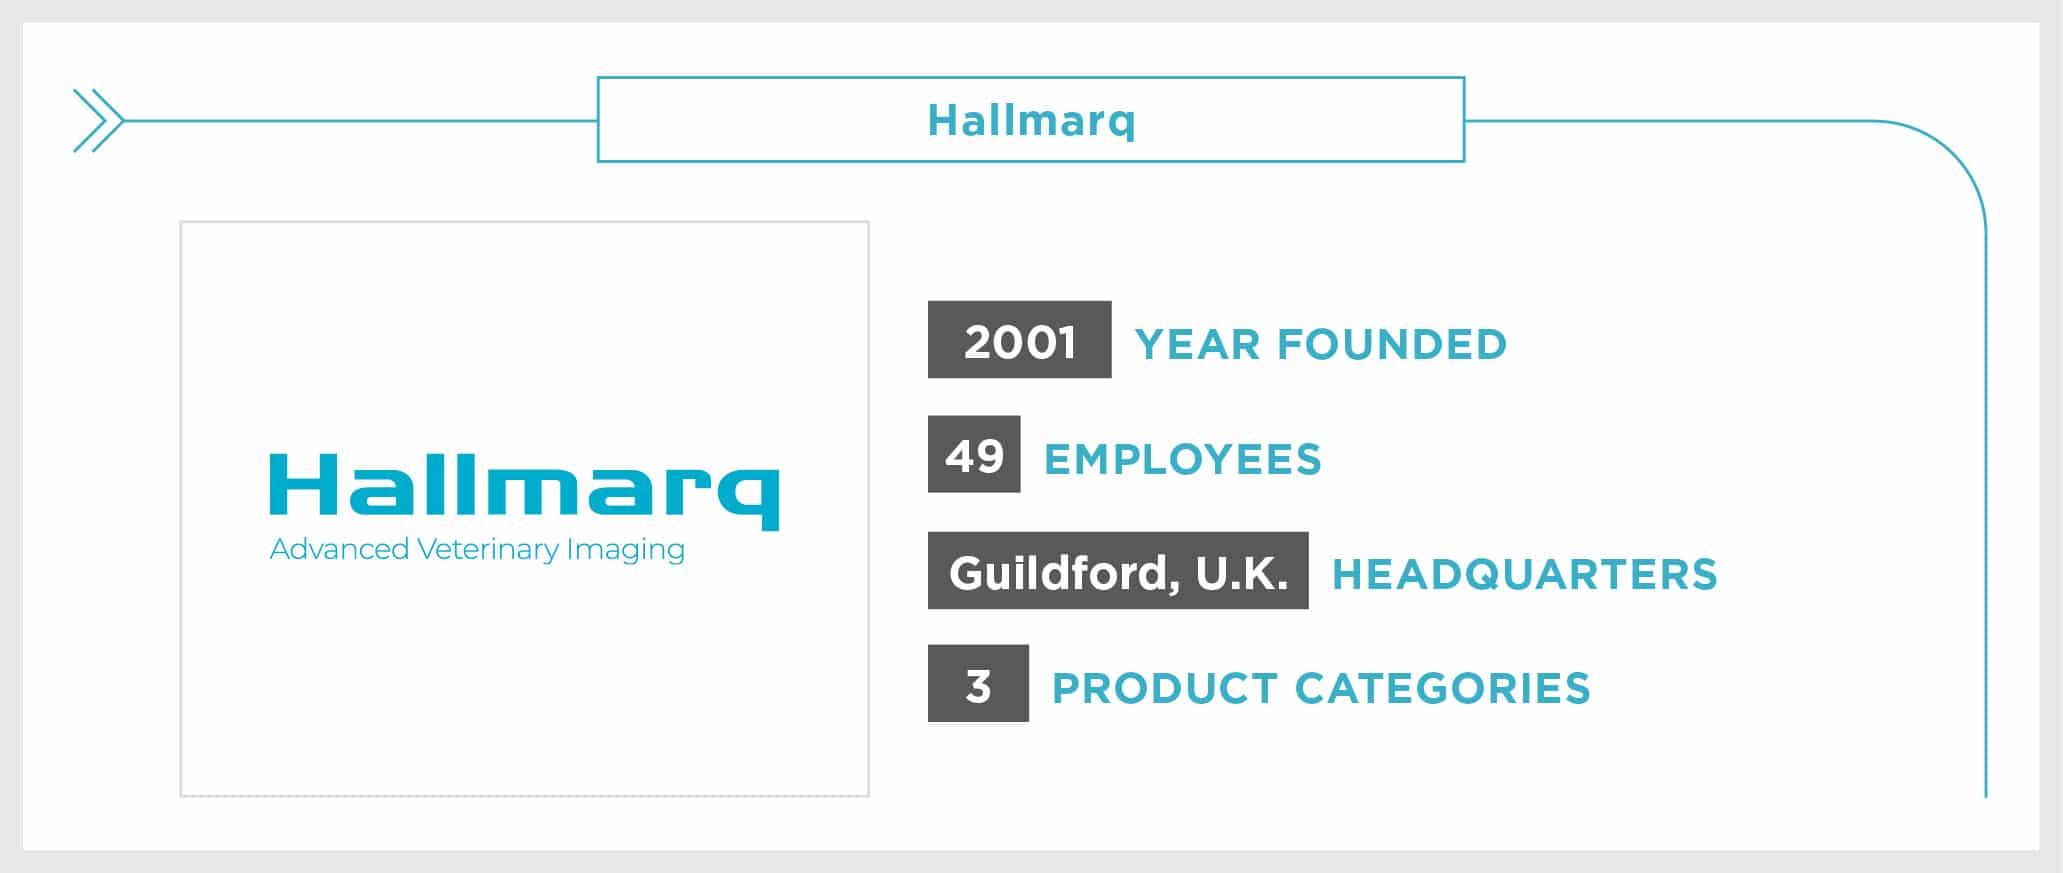 Vision Statement: Hallmarq Veterinary Imaging